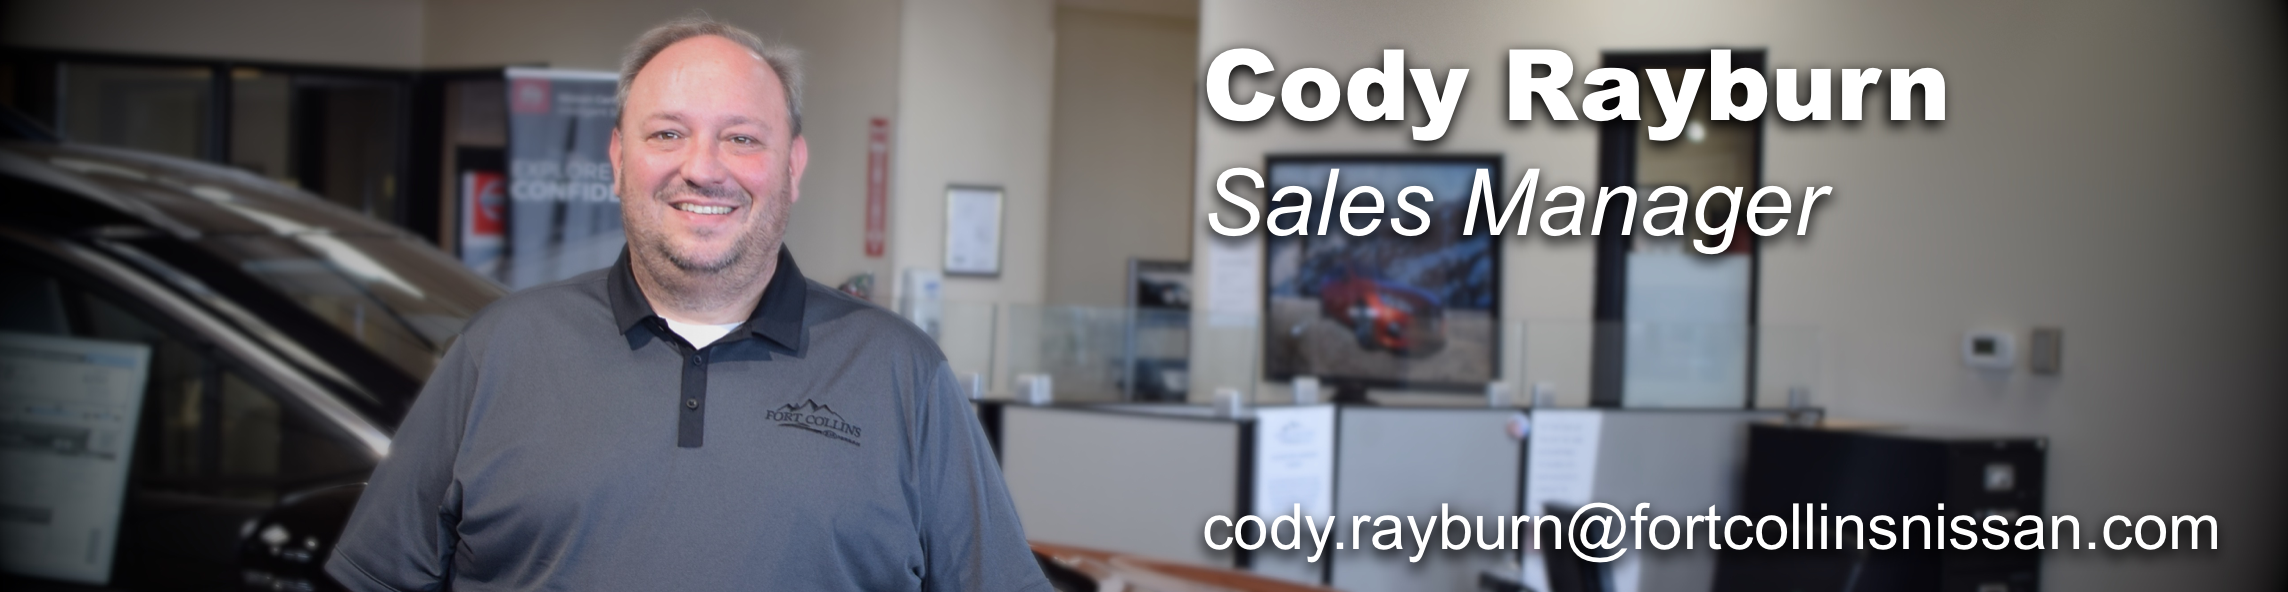 Cody Rayburn